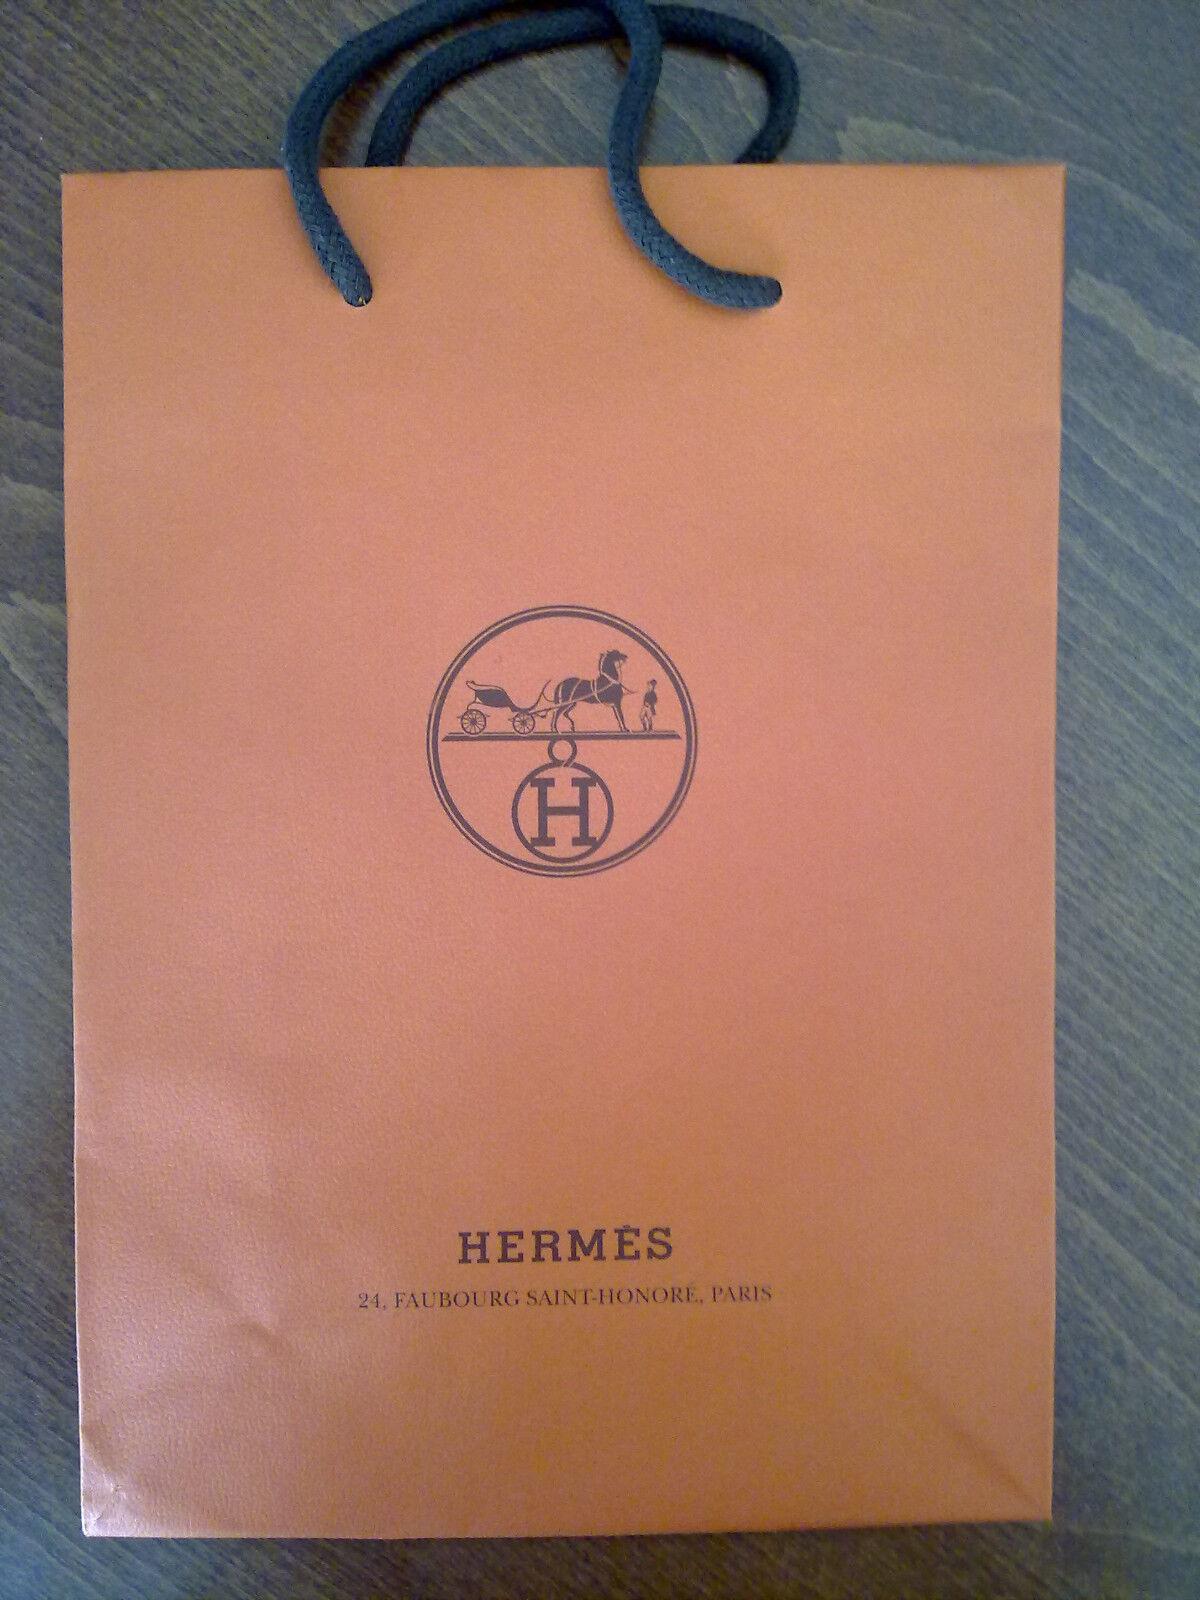 Hermes sac papier - neuf – n'a jamais servi